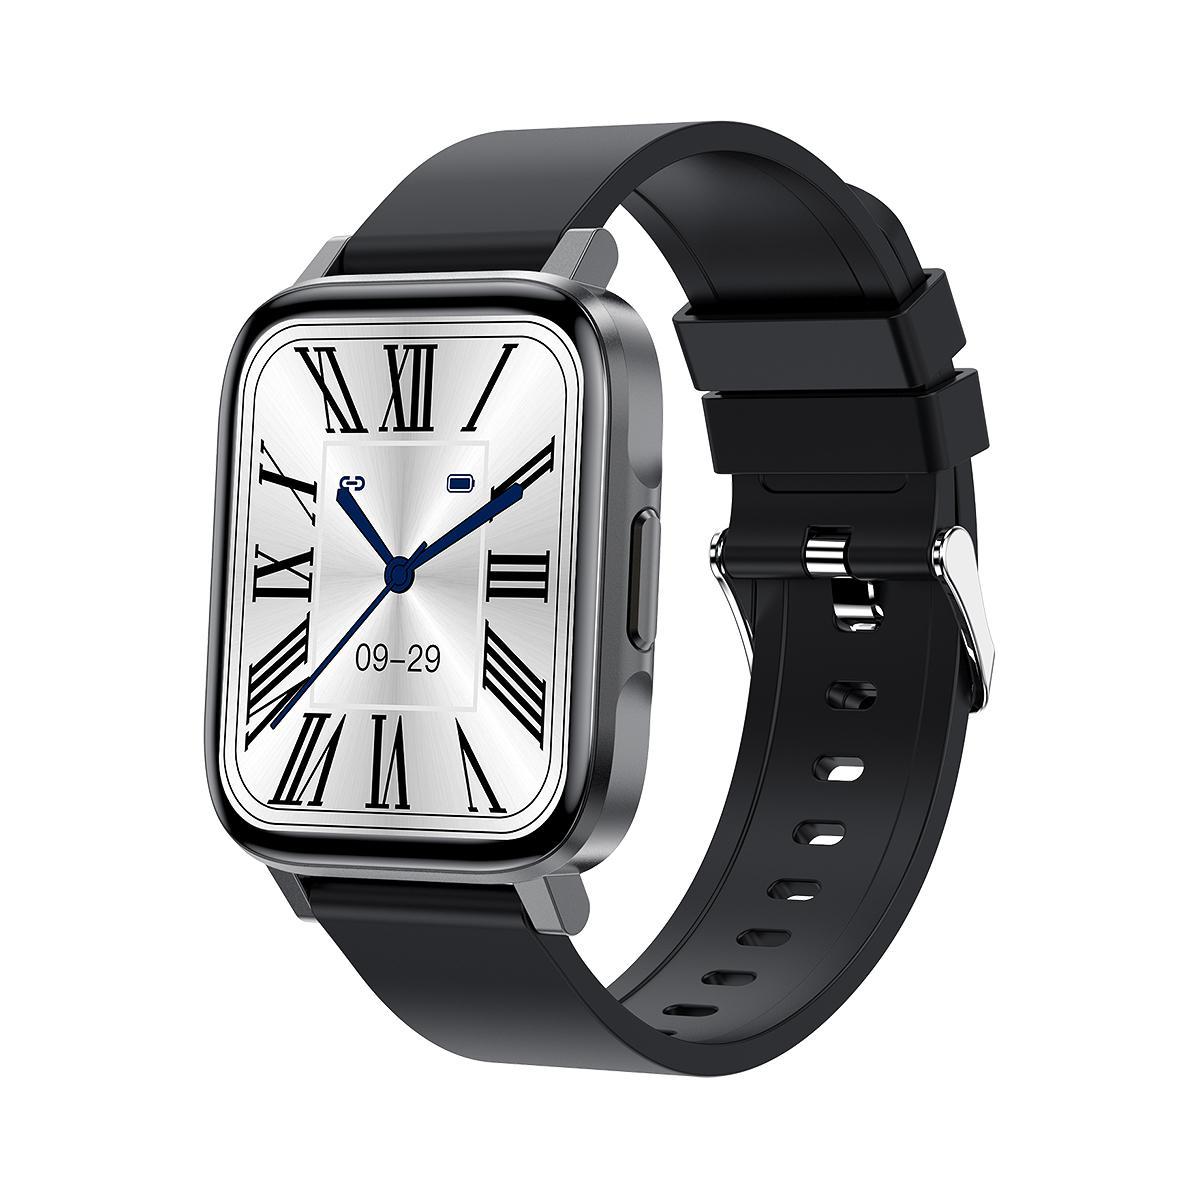 G51 local music palyer digital smart watch 2